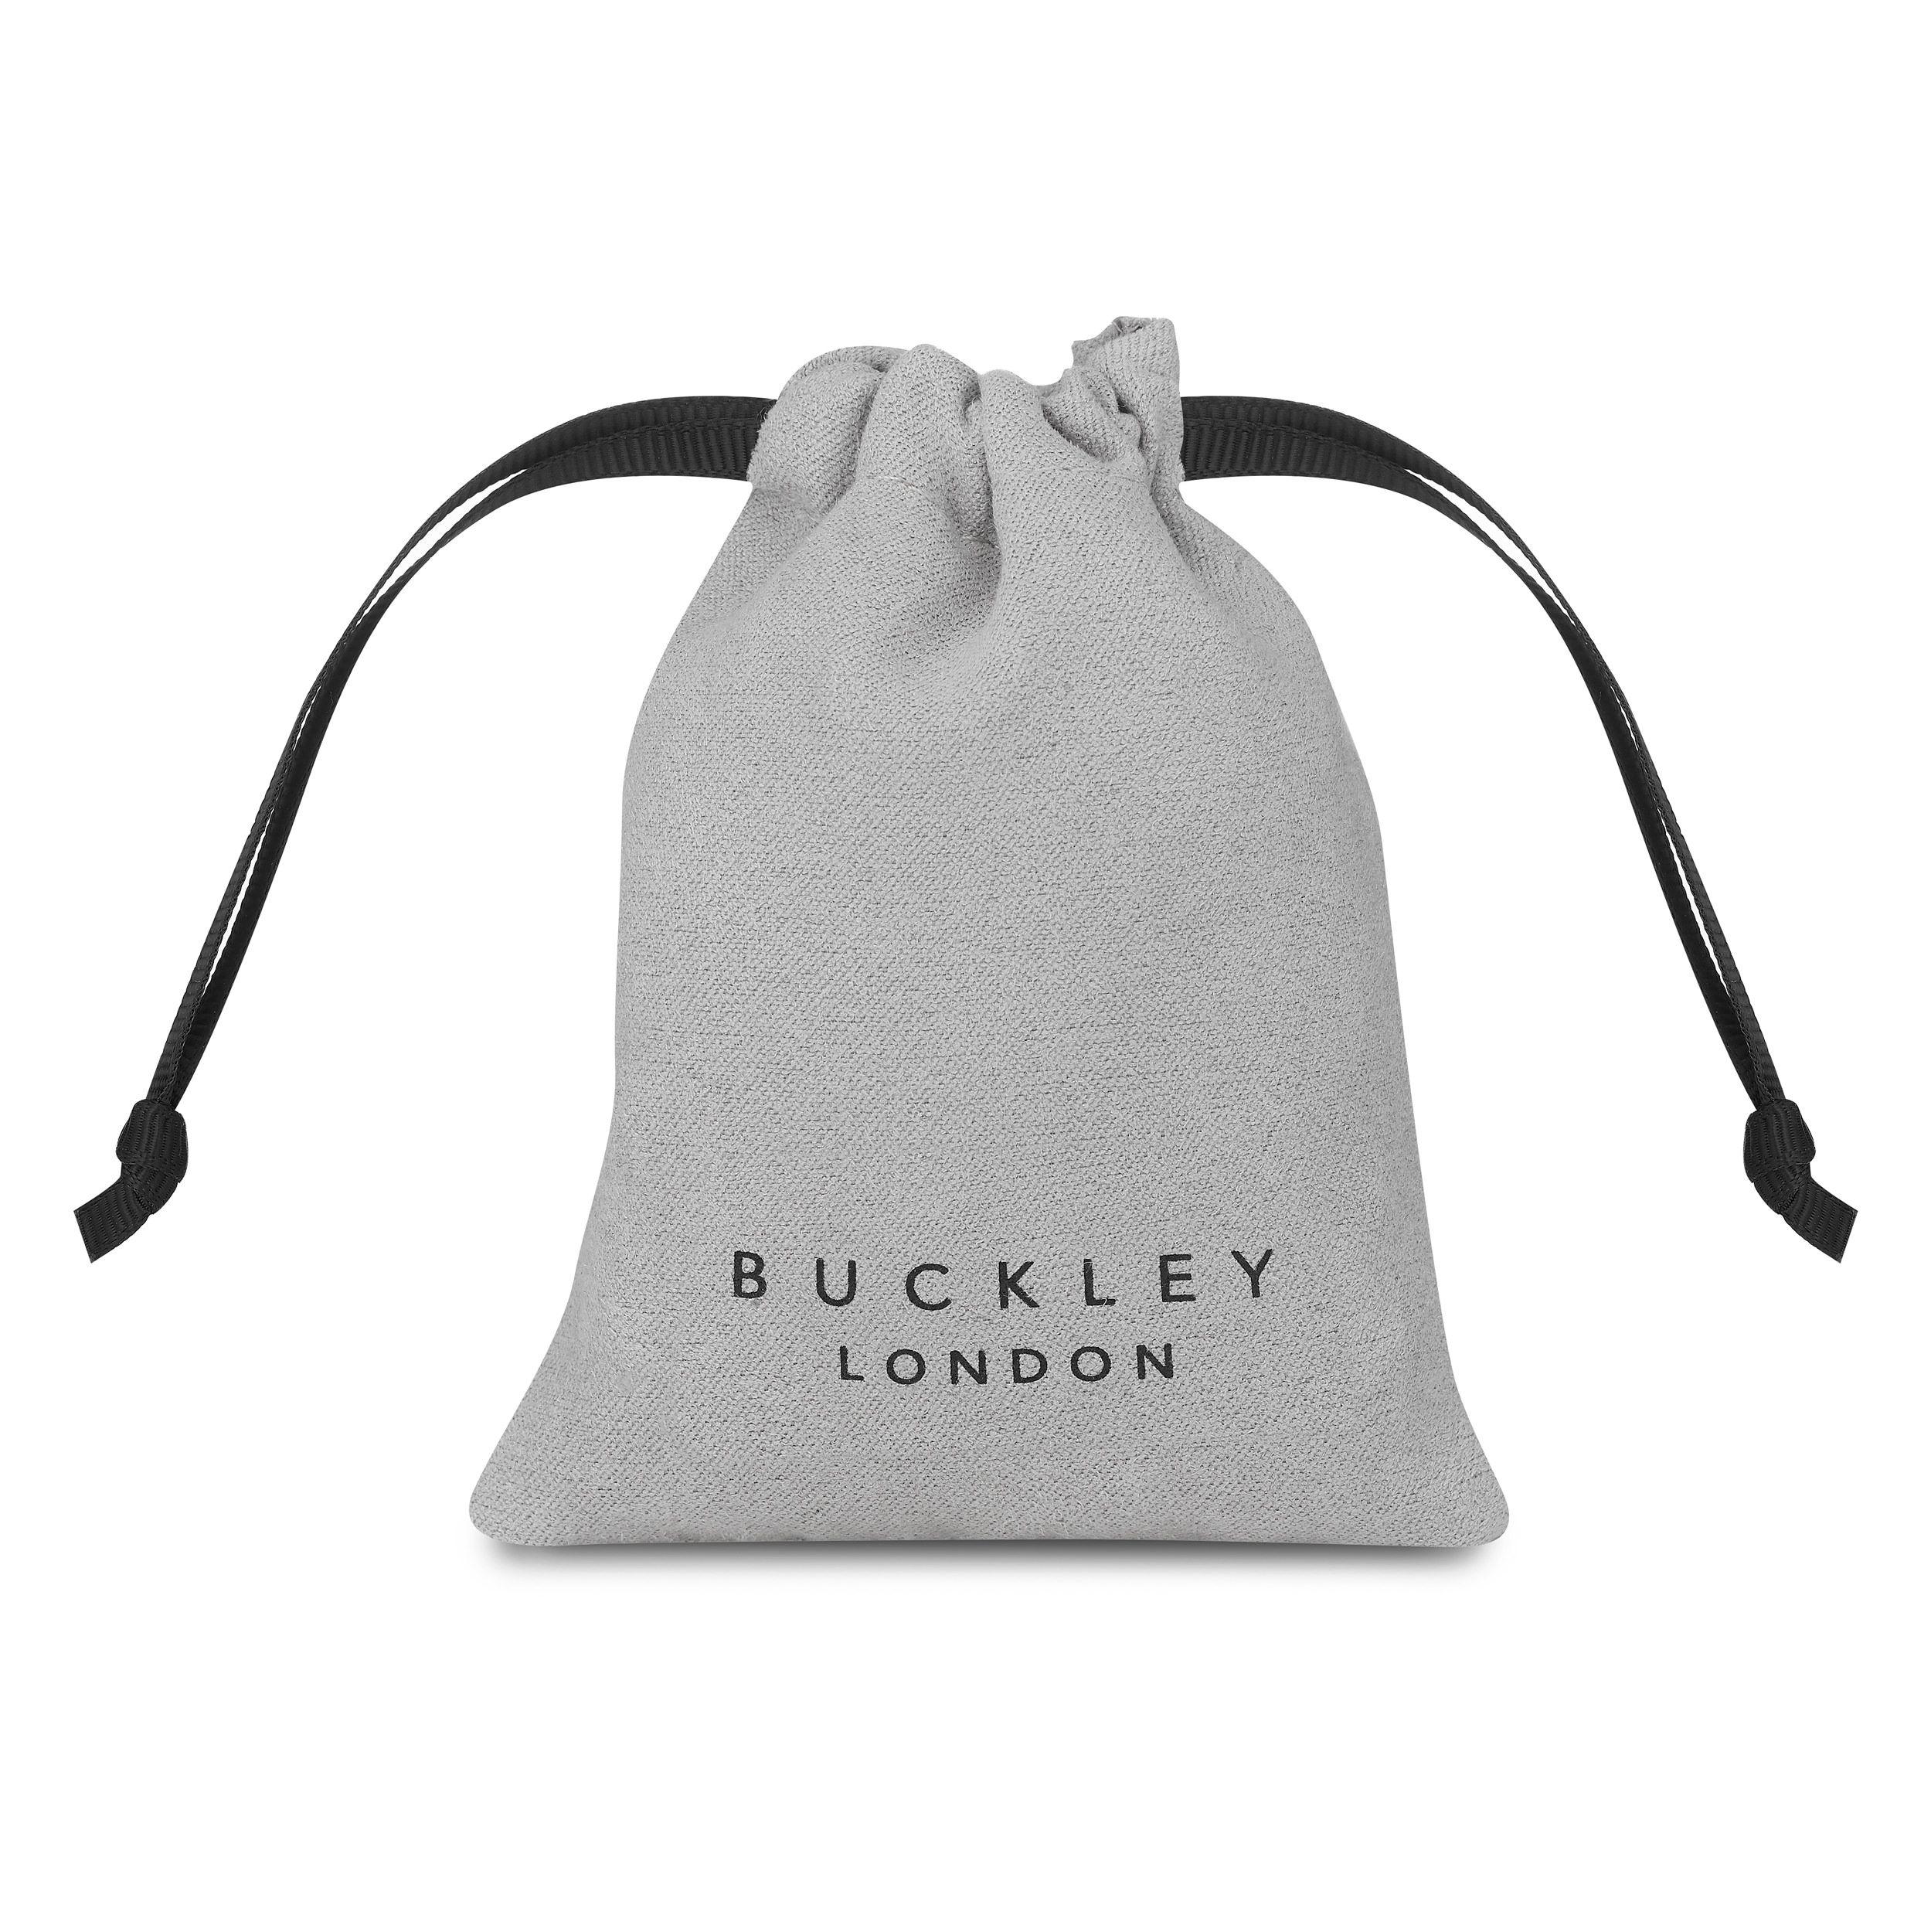 Buckley London Pyramid Bracelet - Rose Gold Bag